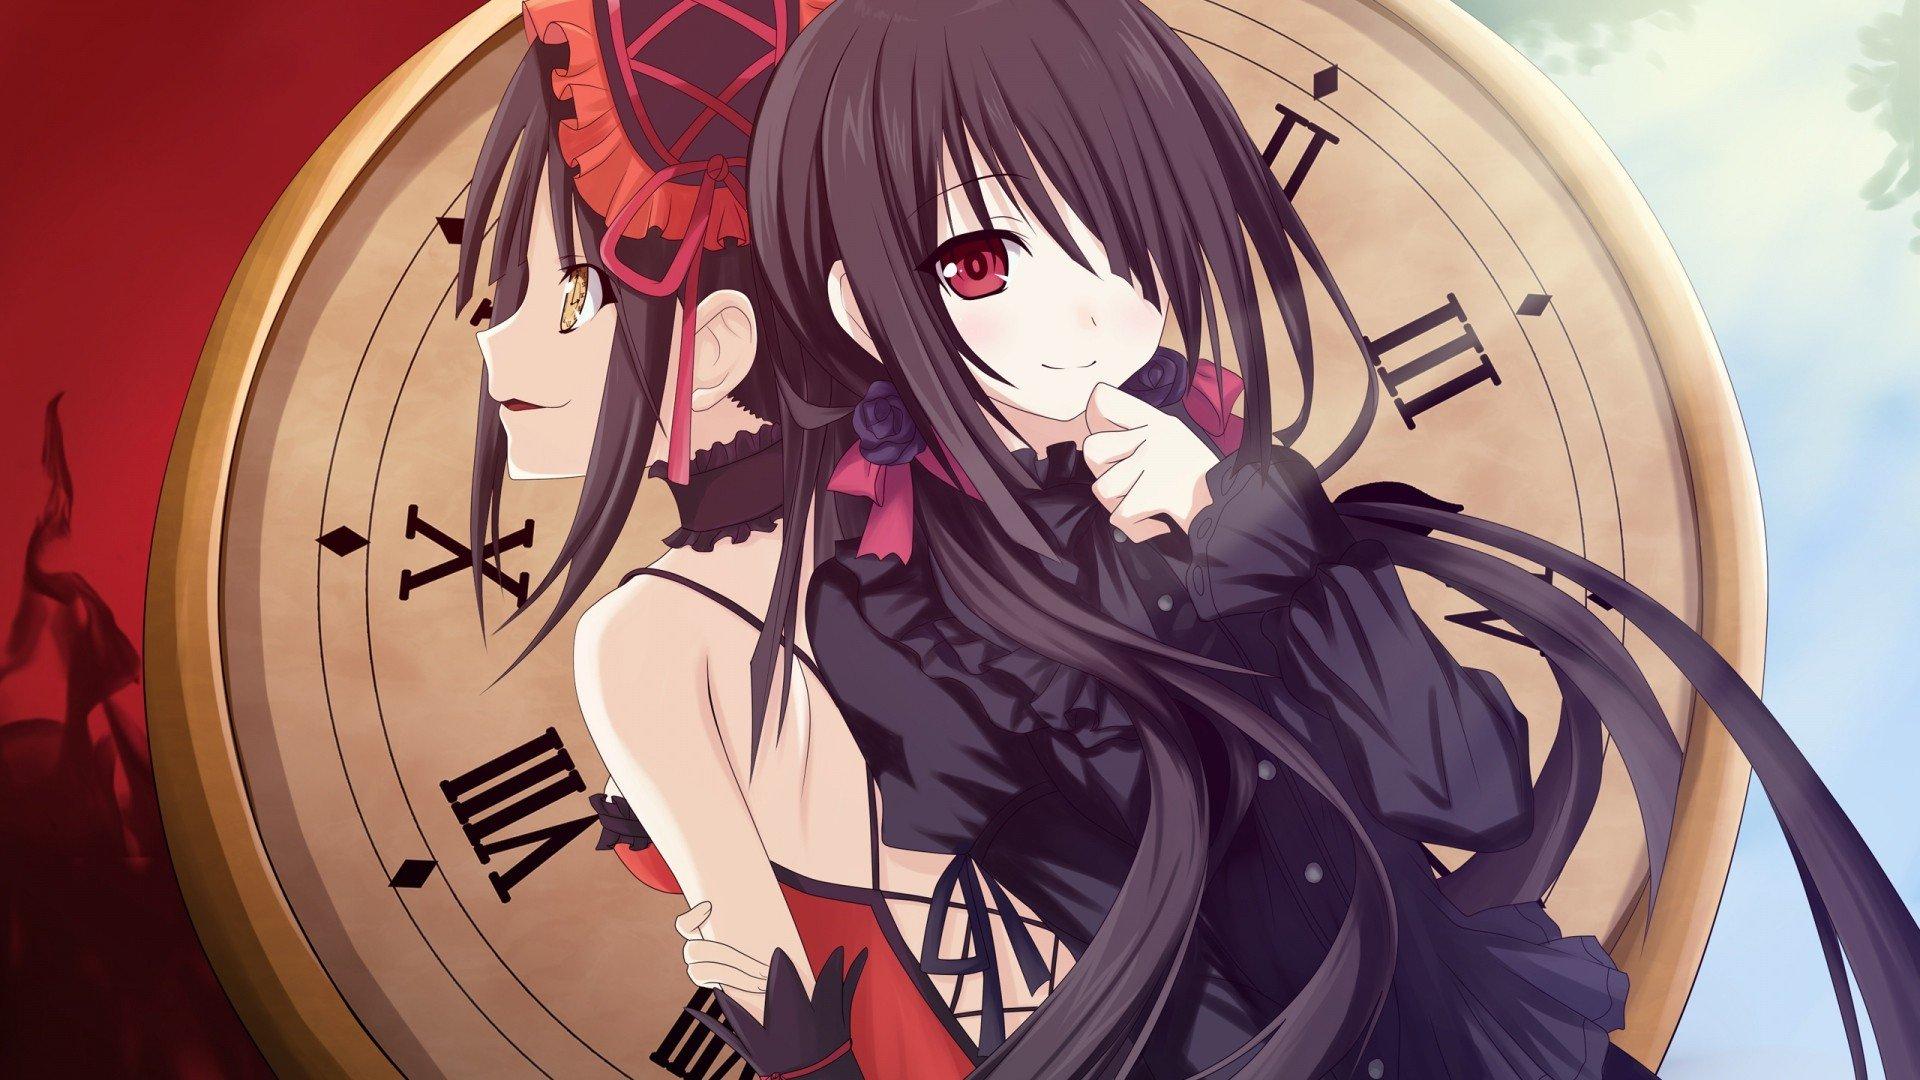 Wallpaper Px Anime Date A Live Tokisaki